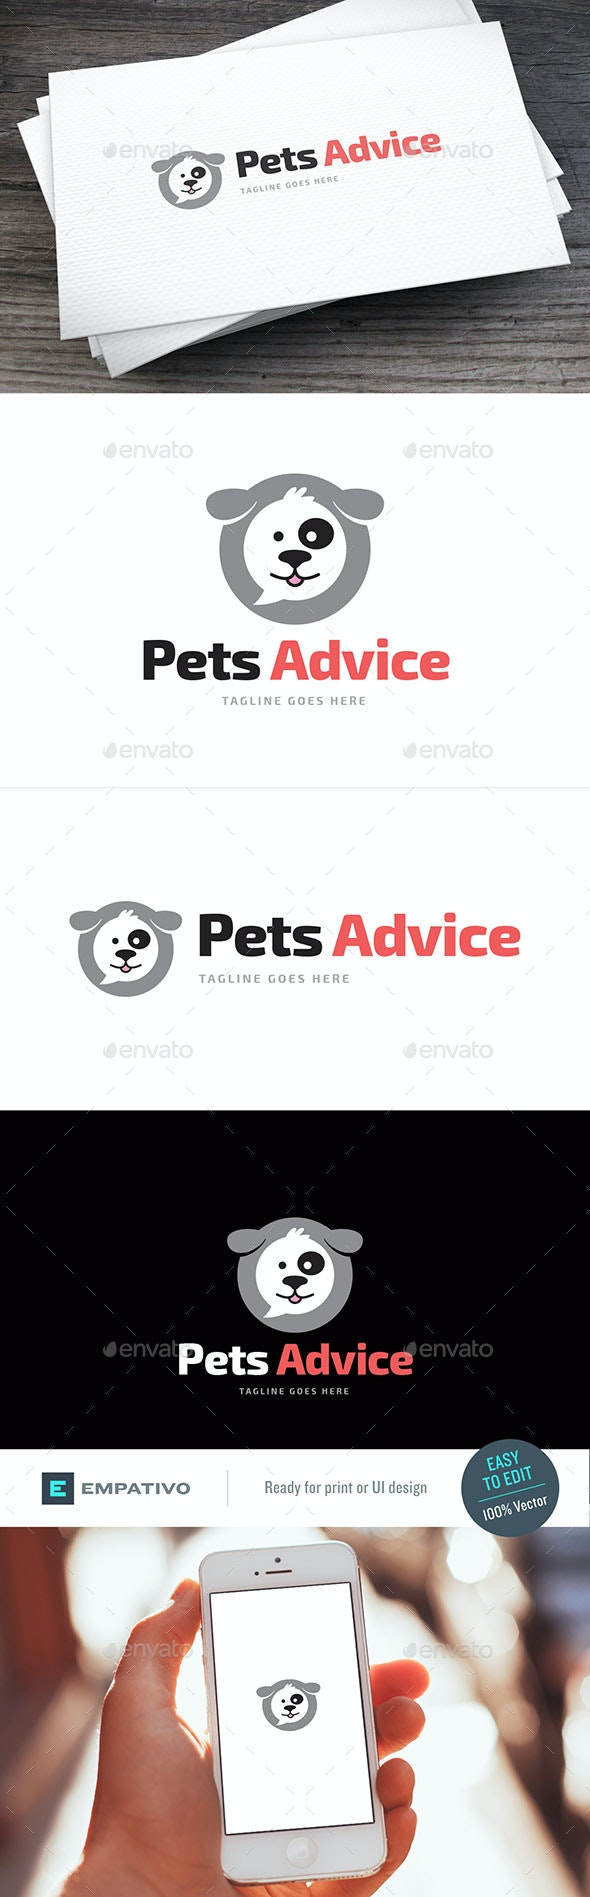 Pets Advice Logo Template - Animals Logo Templates